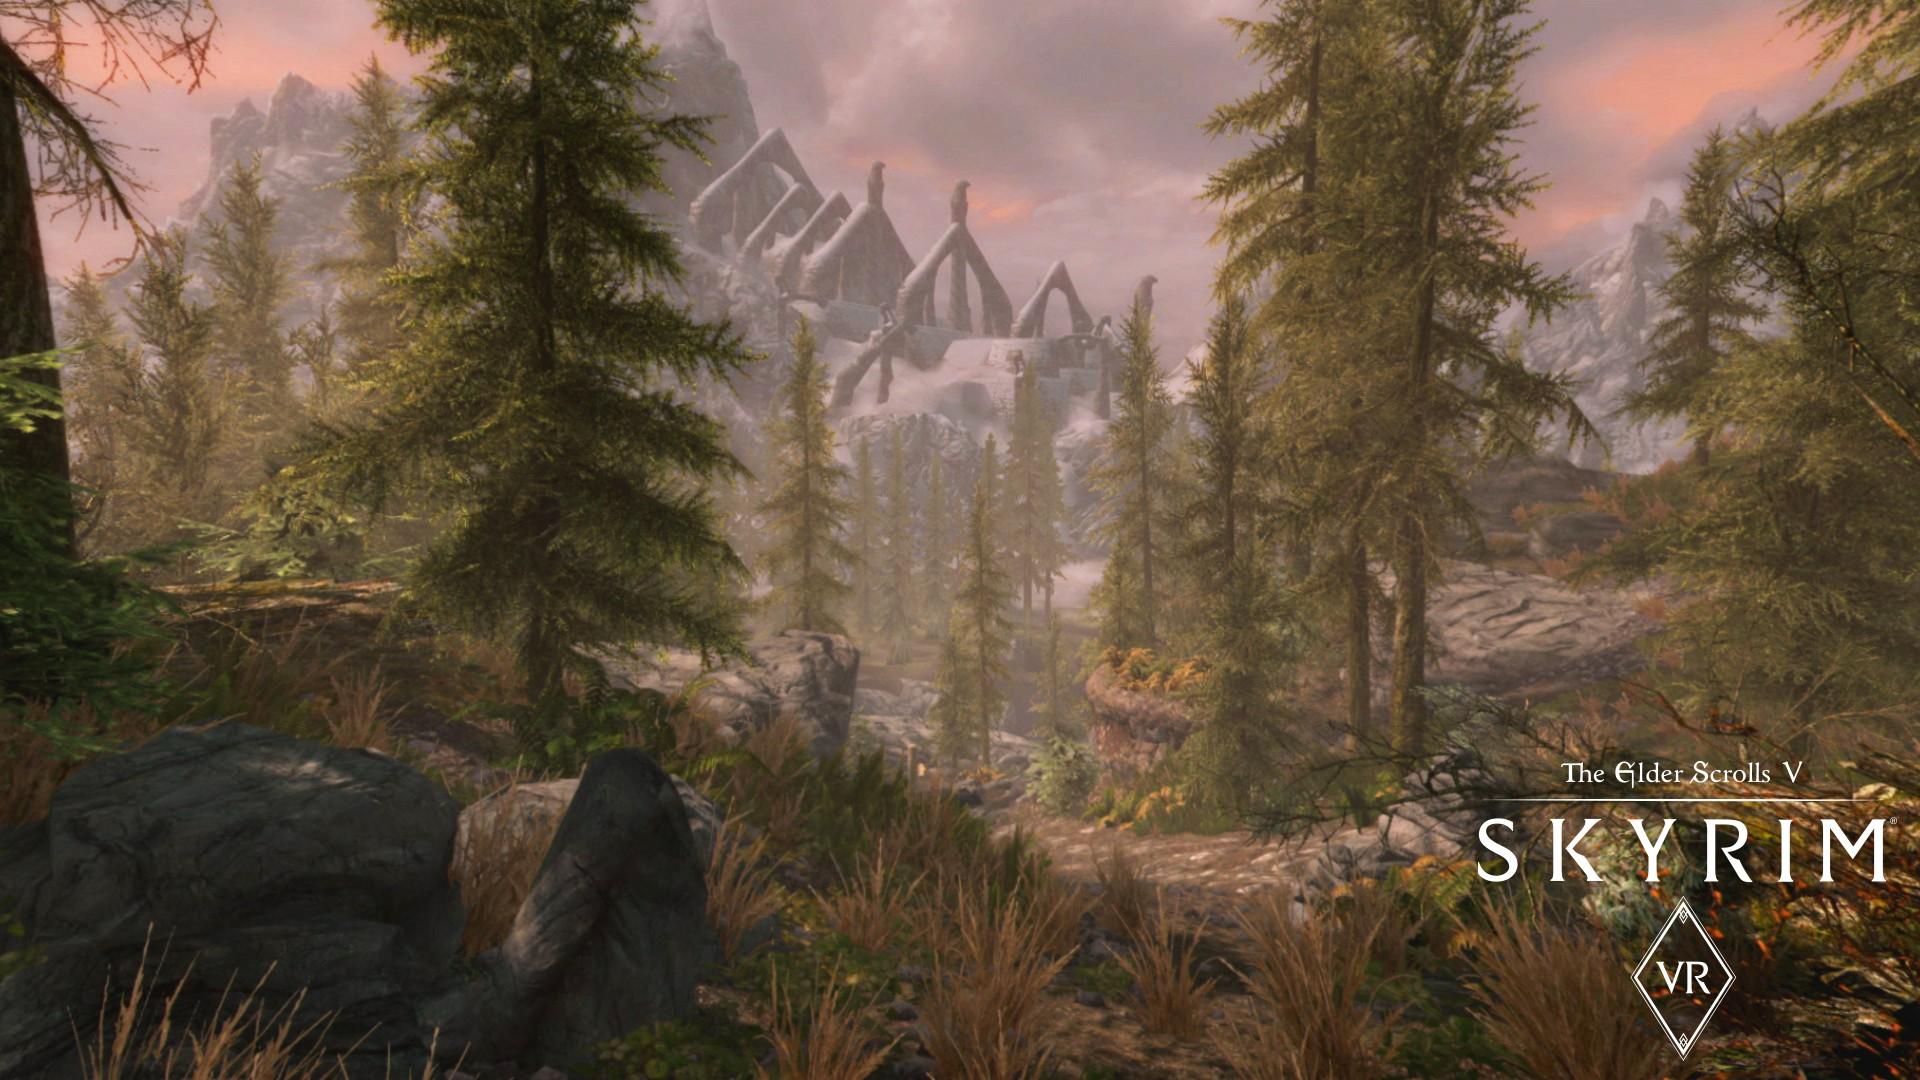 The Elder Scrolls V: Skyrim VR_gallery_1